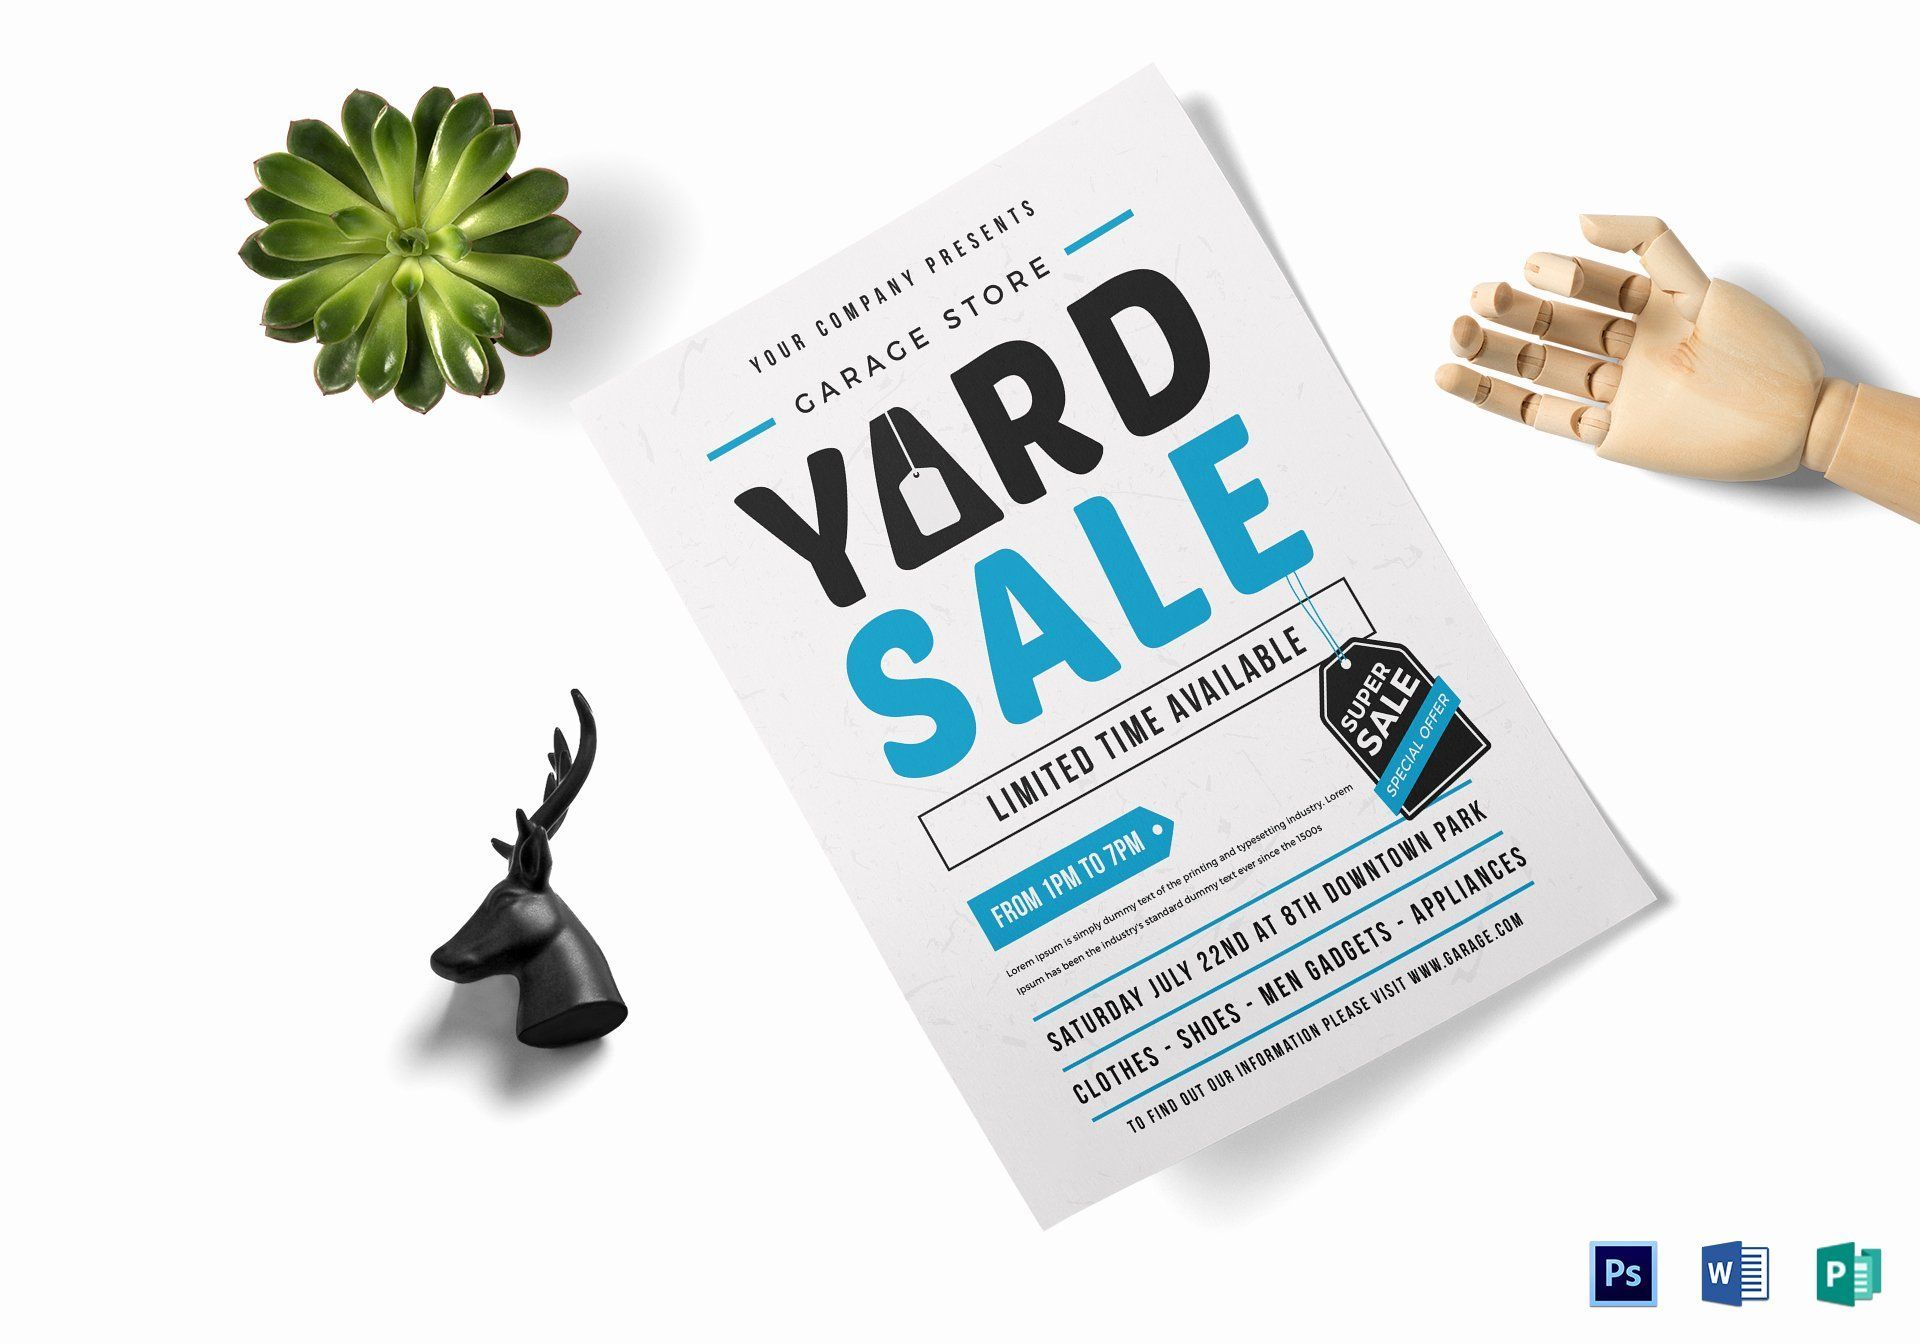 Yard Sale Flyer Template Word Best Of Unique Yard Sale Flyer Design Template In Design Flyer Sale Template Unique Word Yard In 2020 Flyer Design Templates